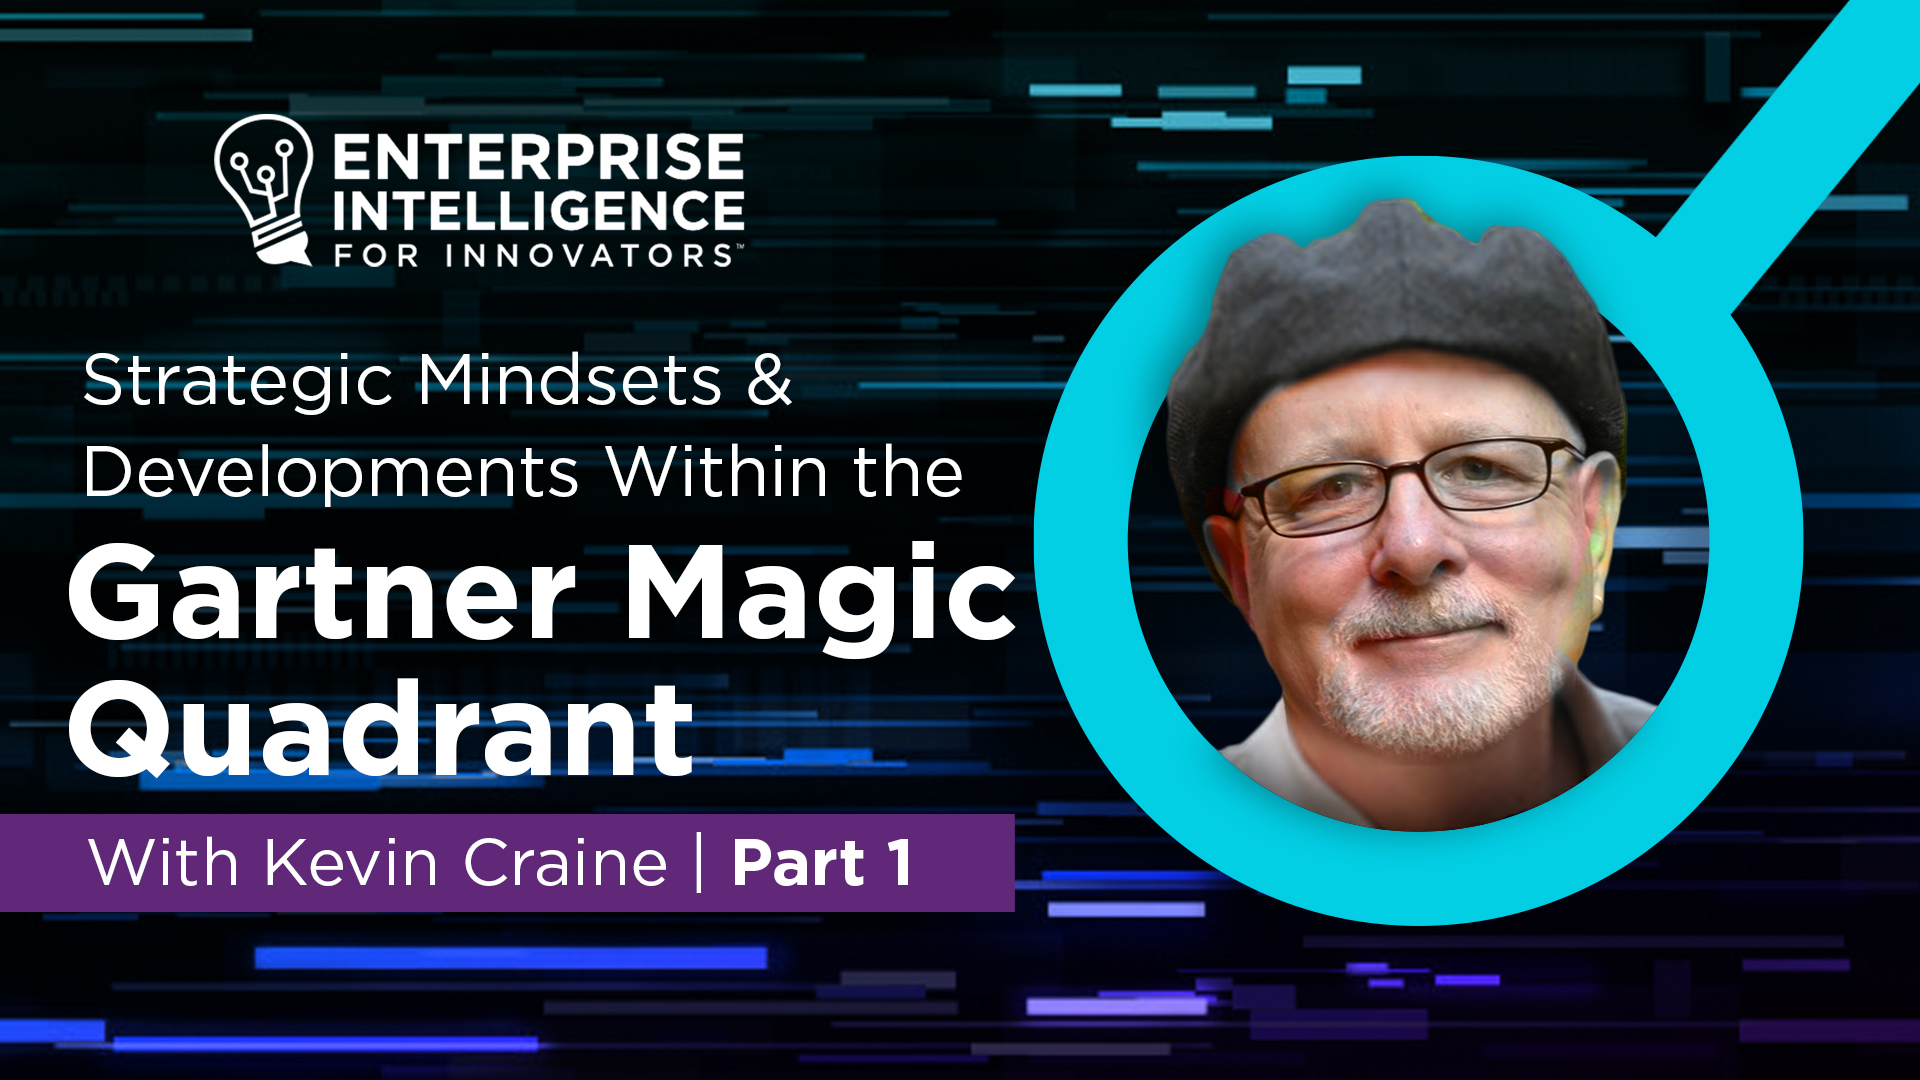 Episode 2: Enterprise Content Management Influencer and podcaster Kevin Craine